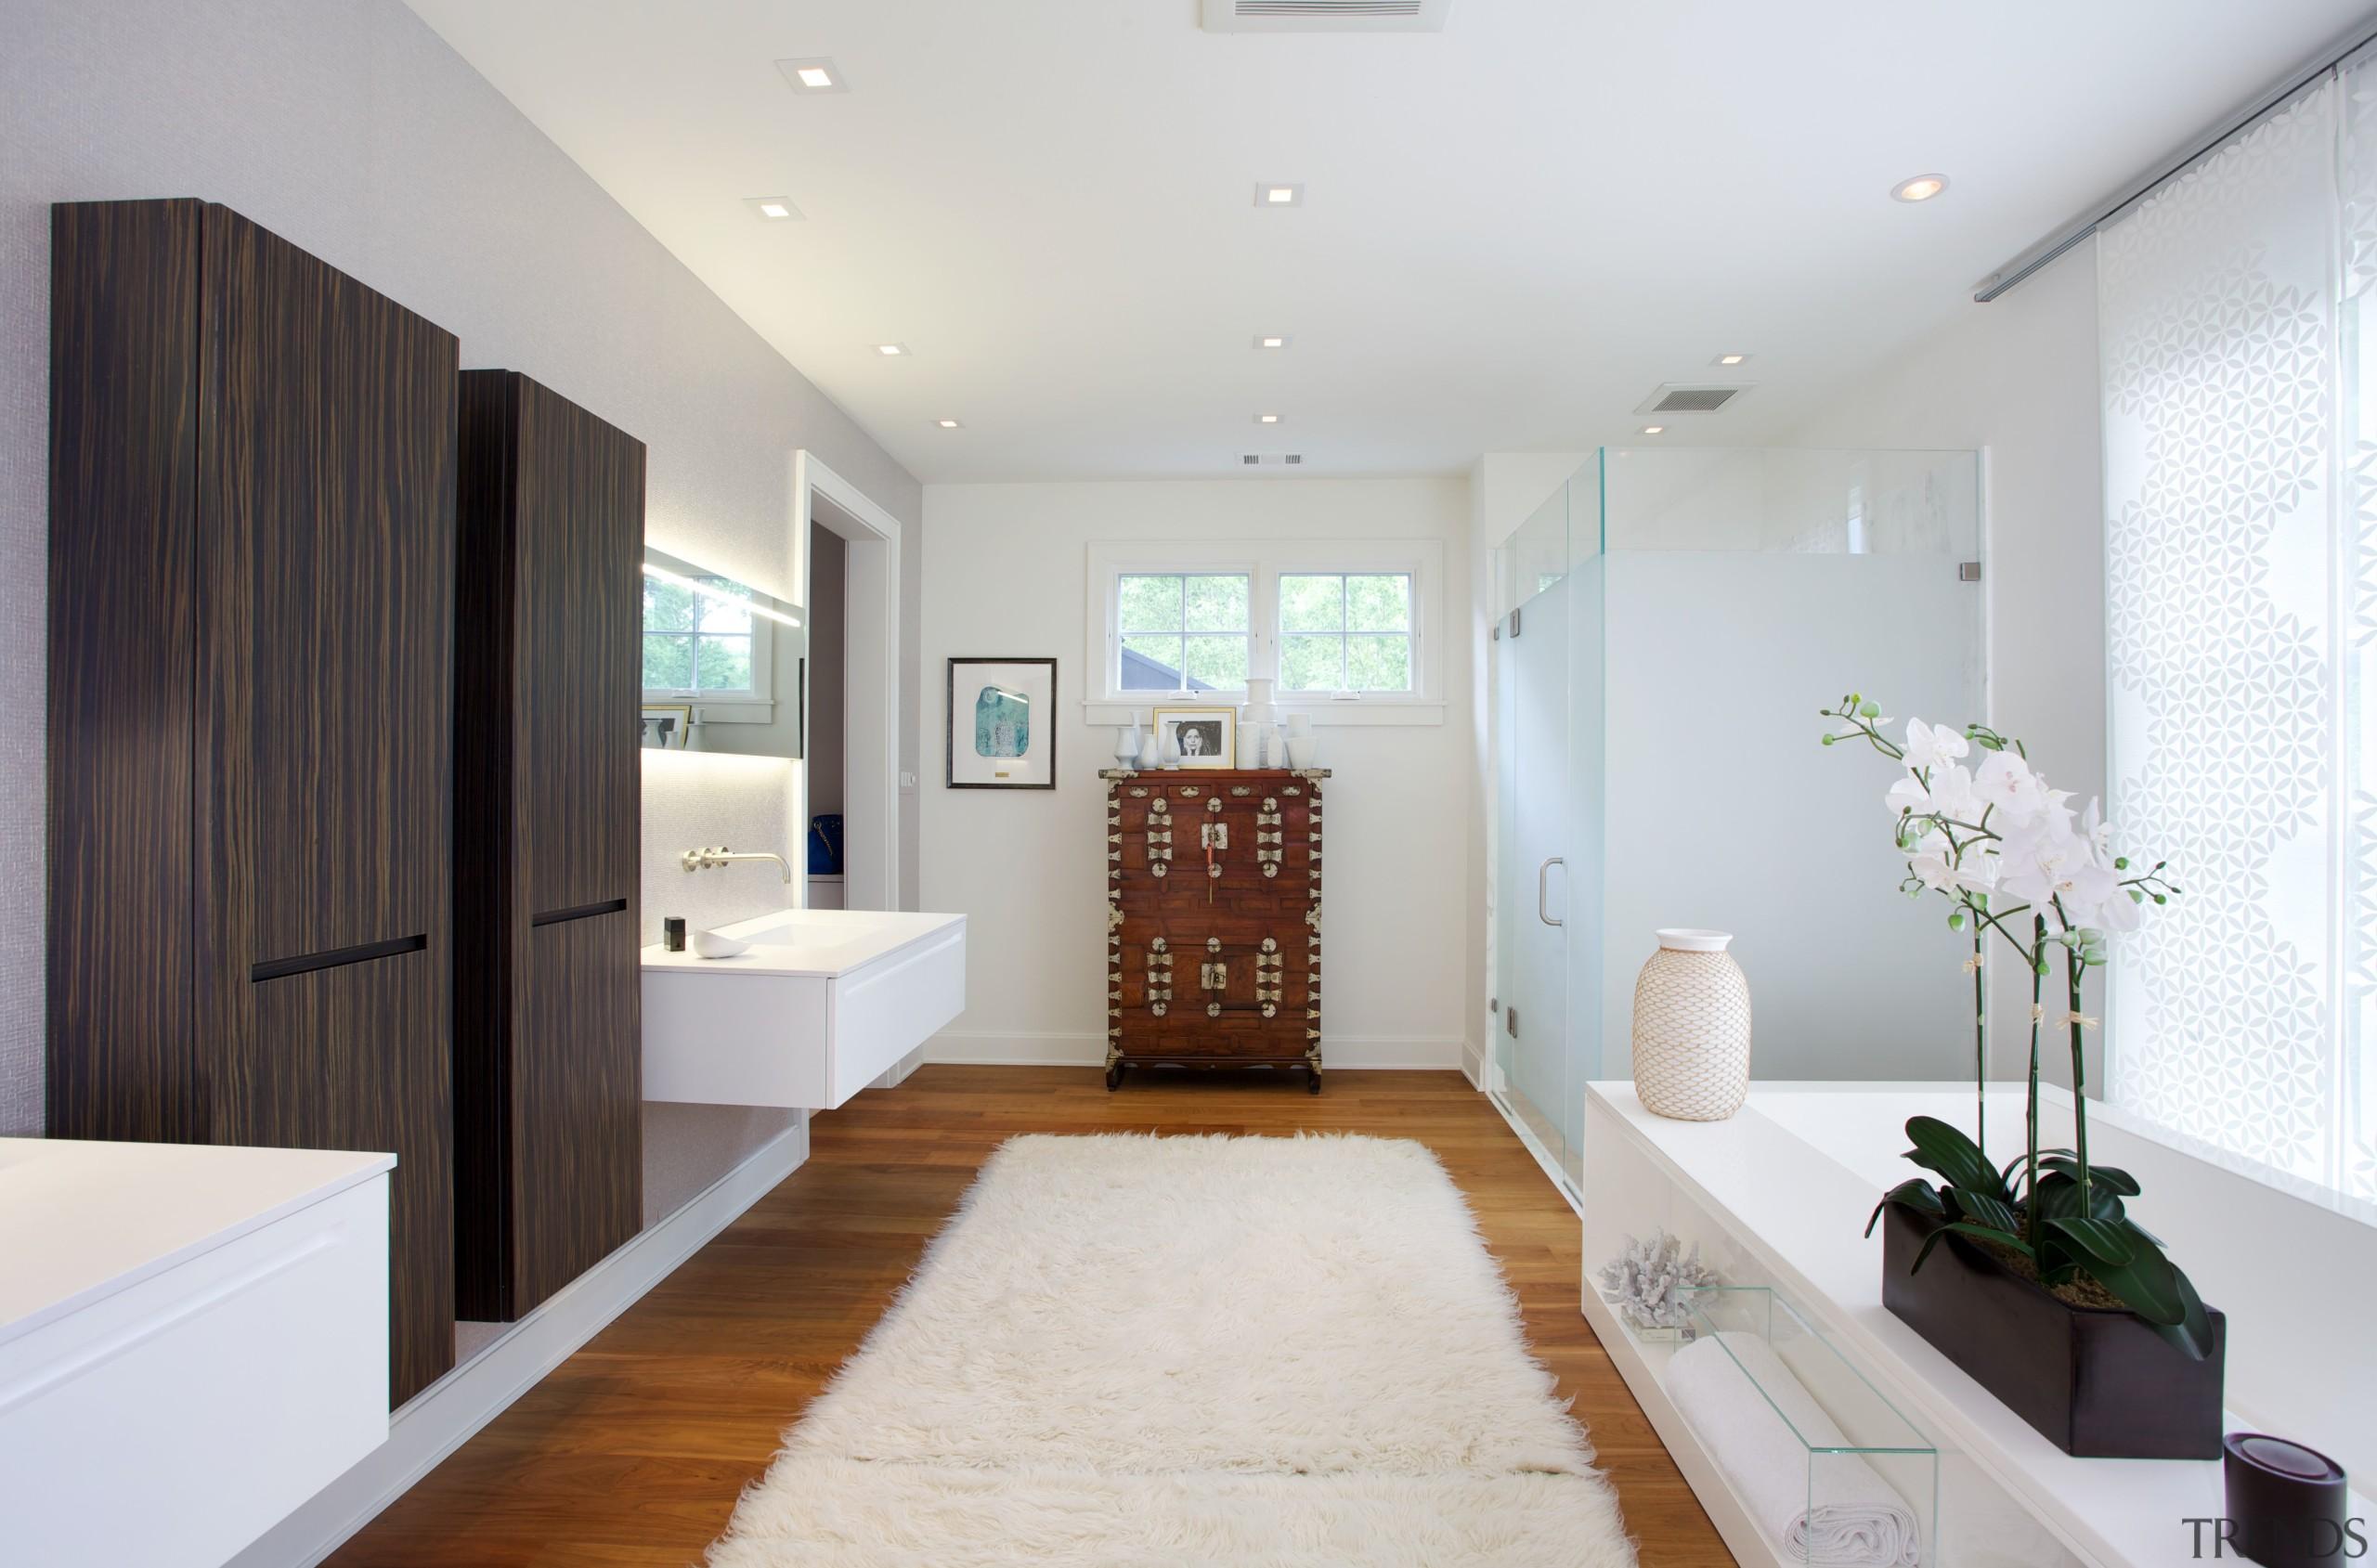 This master bathroom, designed by Nestor Santa-Cruz, continues bathroom, ceiling, floor, home, interior design, living room, real estate, room, white, gray